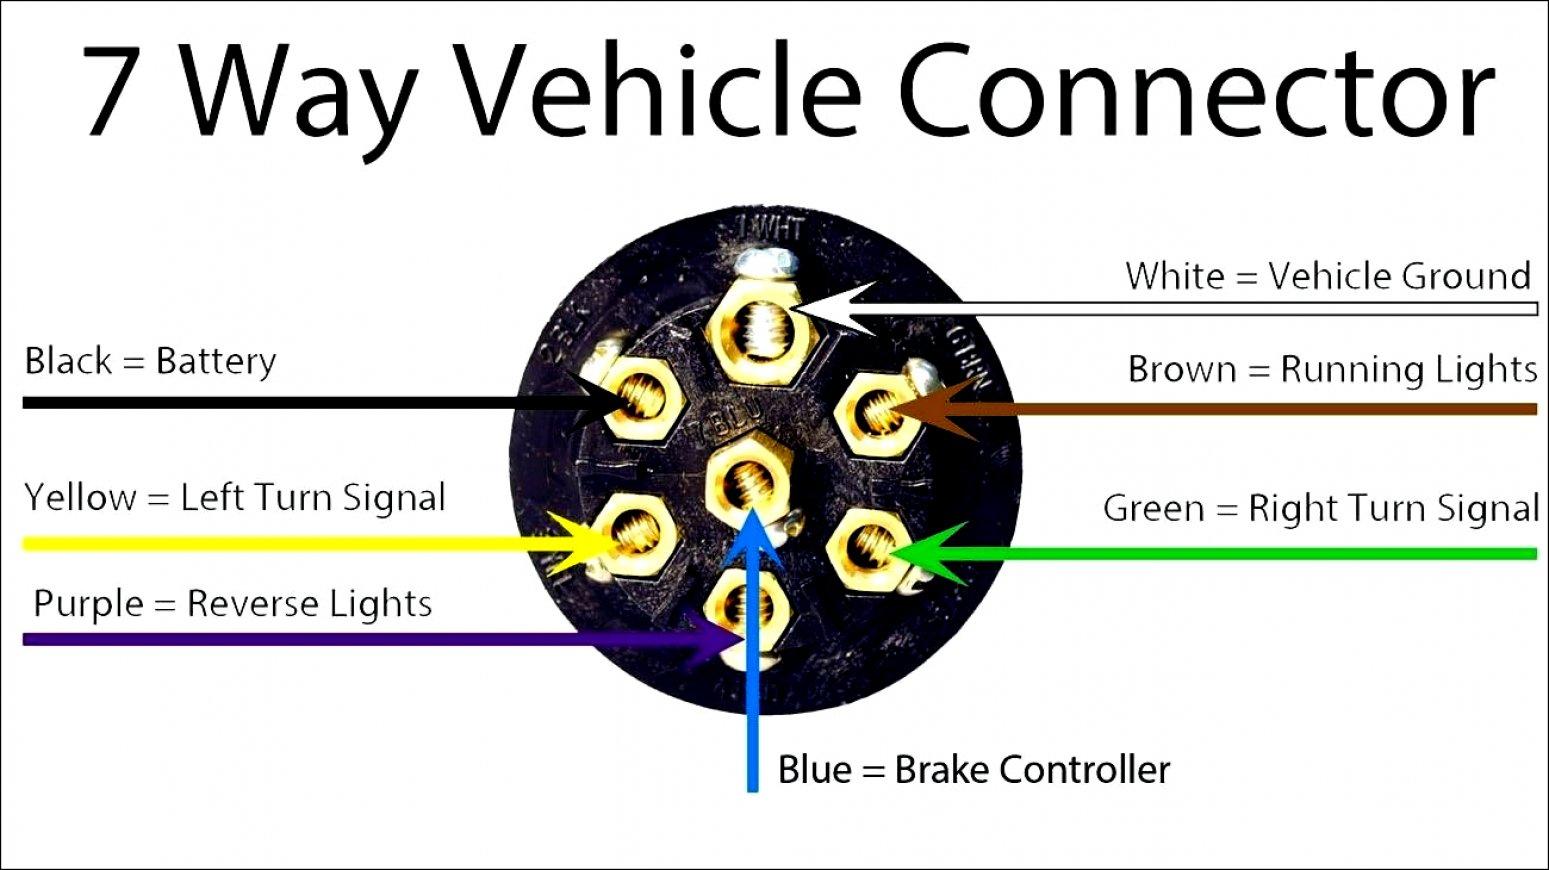 7 Way Plug Wiring Diagram Trailer   Wiring Diagram - Rv Trailer Wiring Diagram